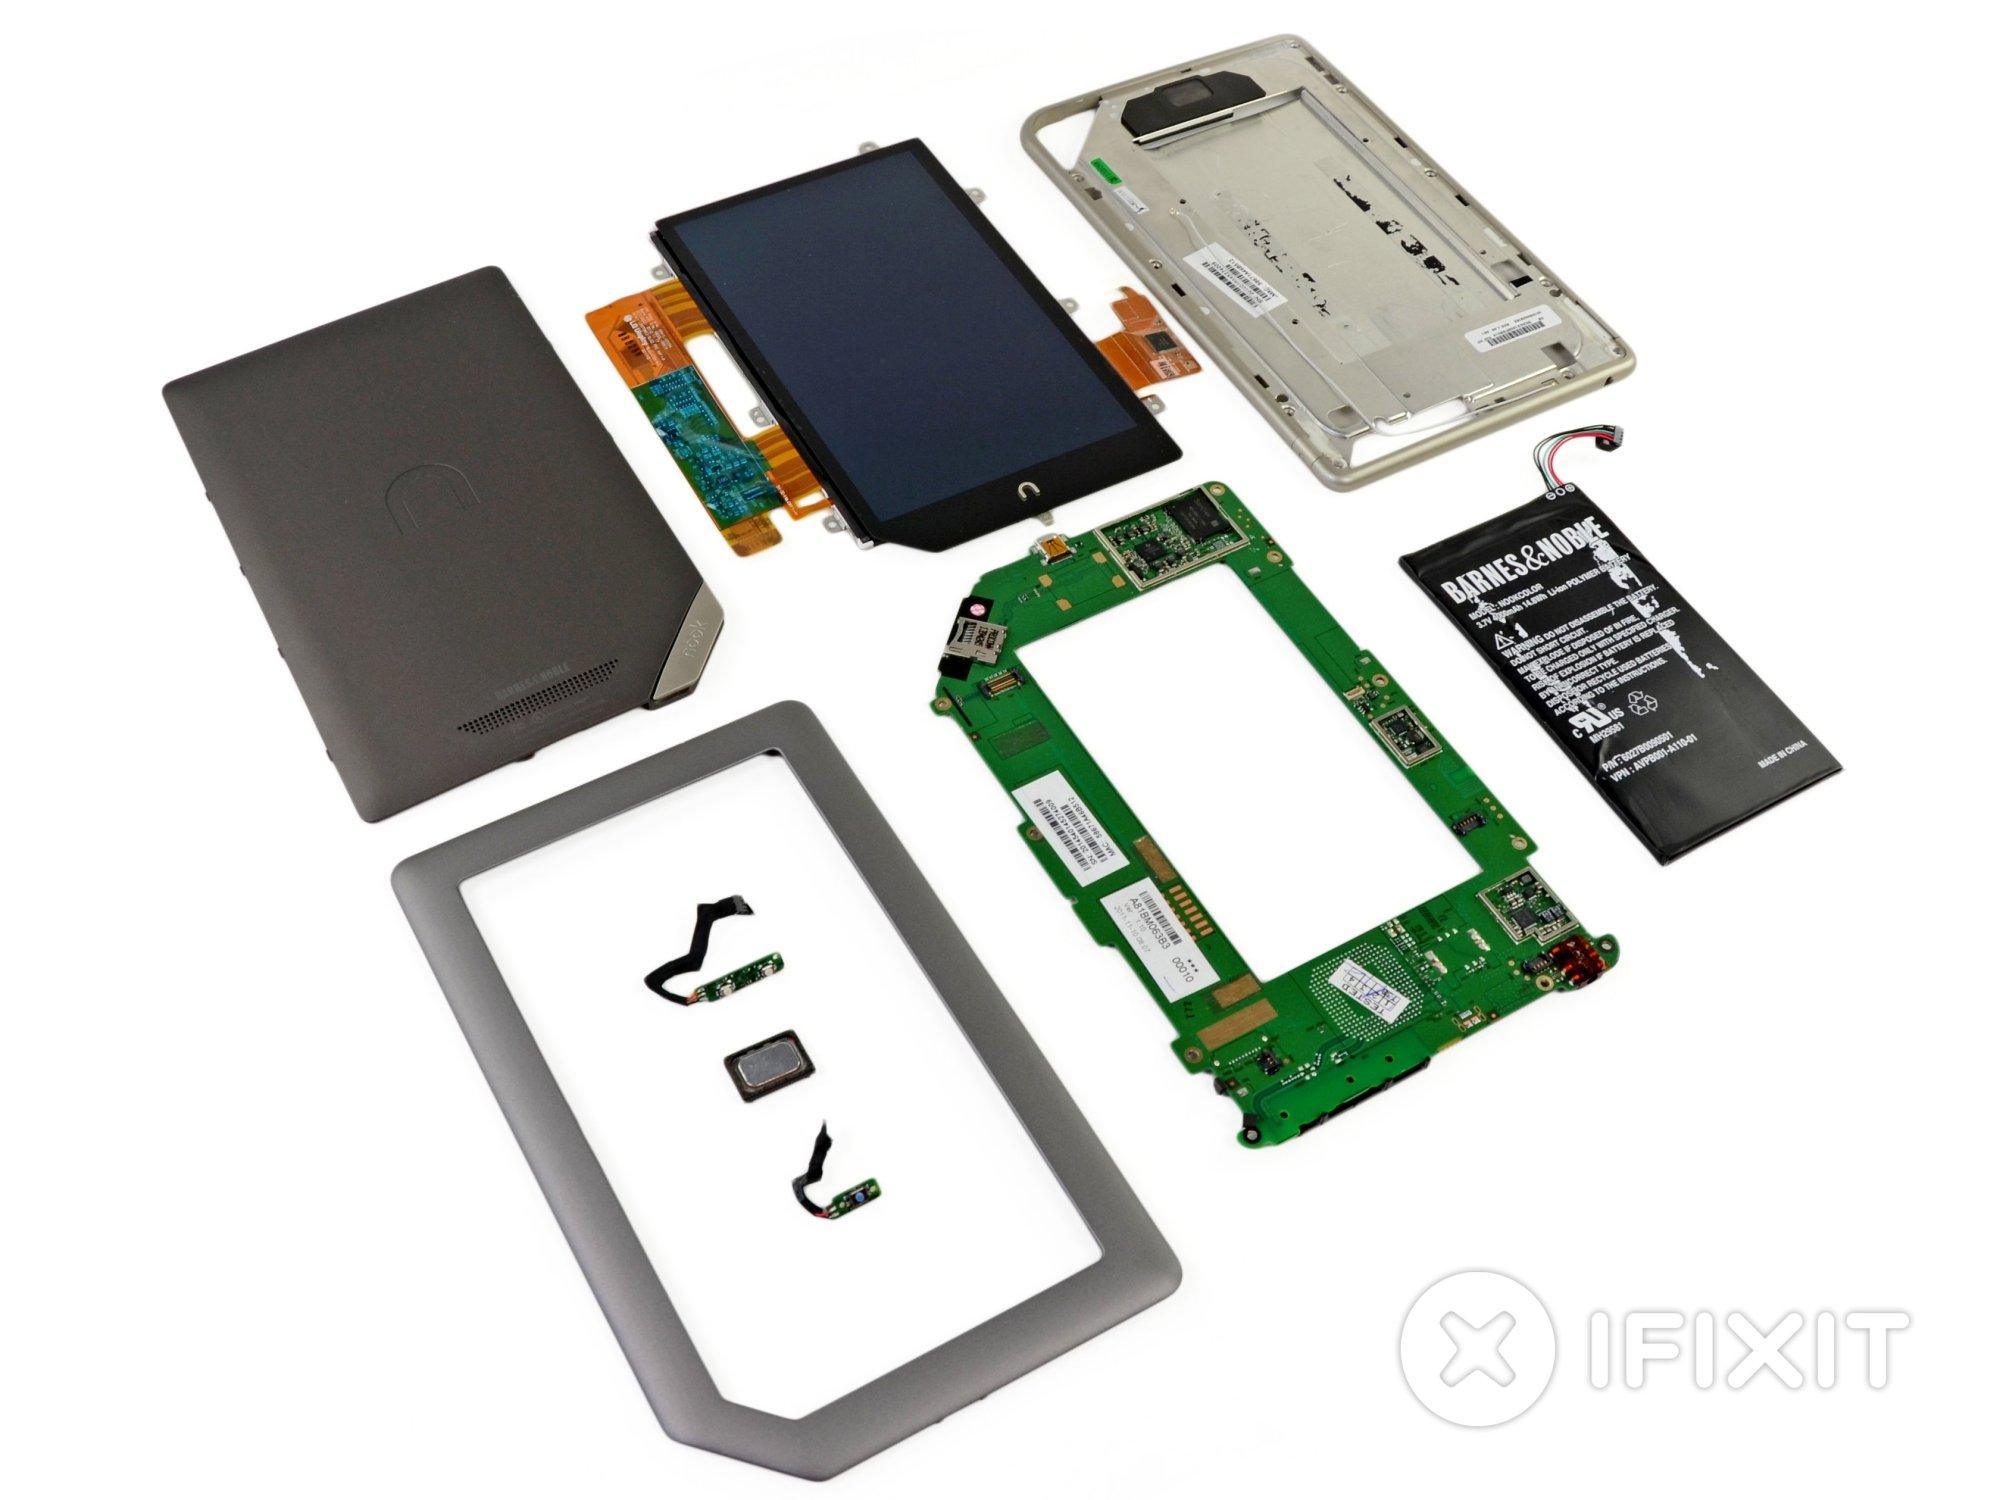 hight resolution of nook tablet teardown ifixit nook motherboard diagram